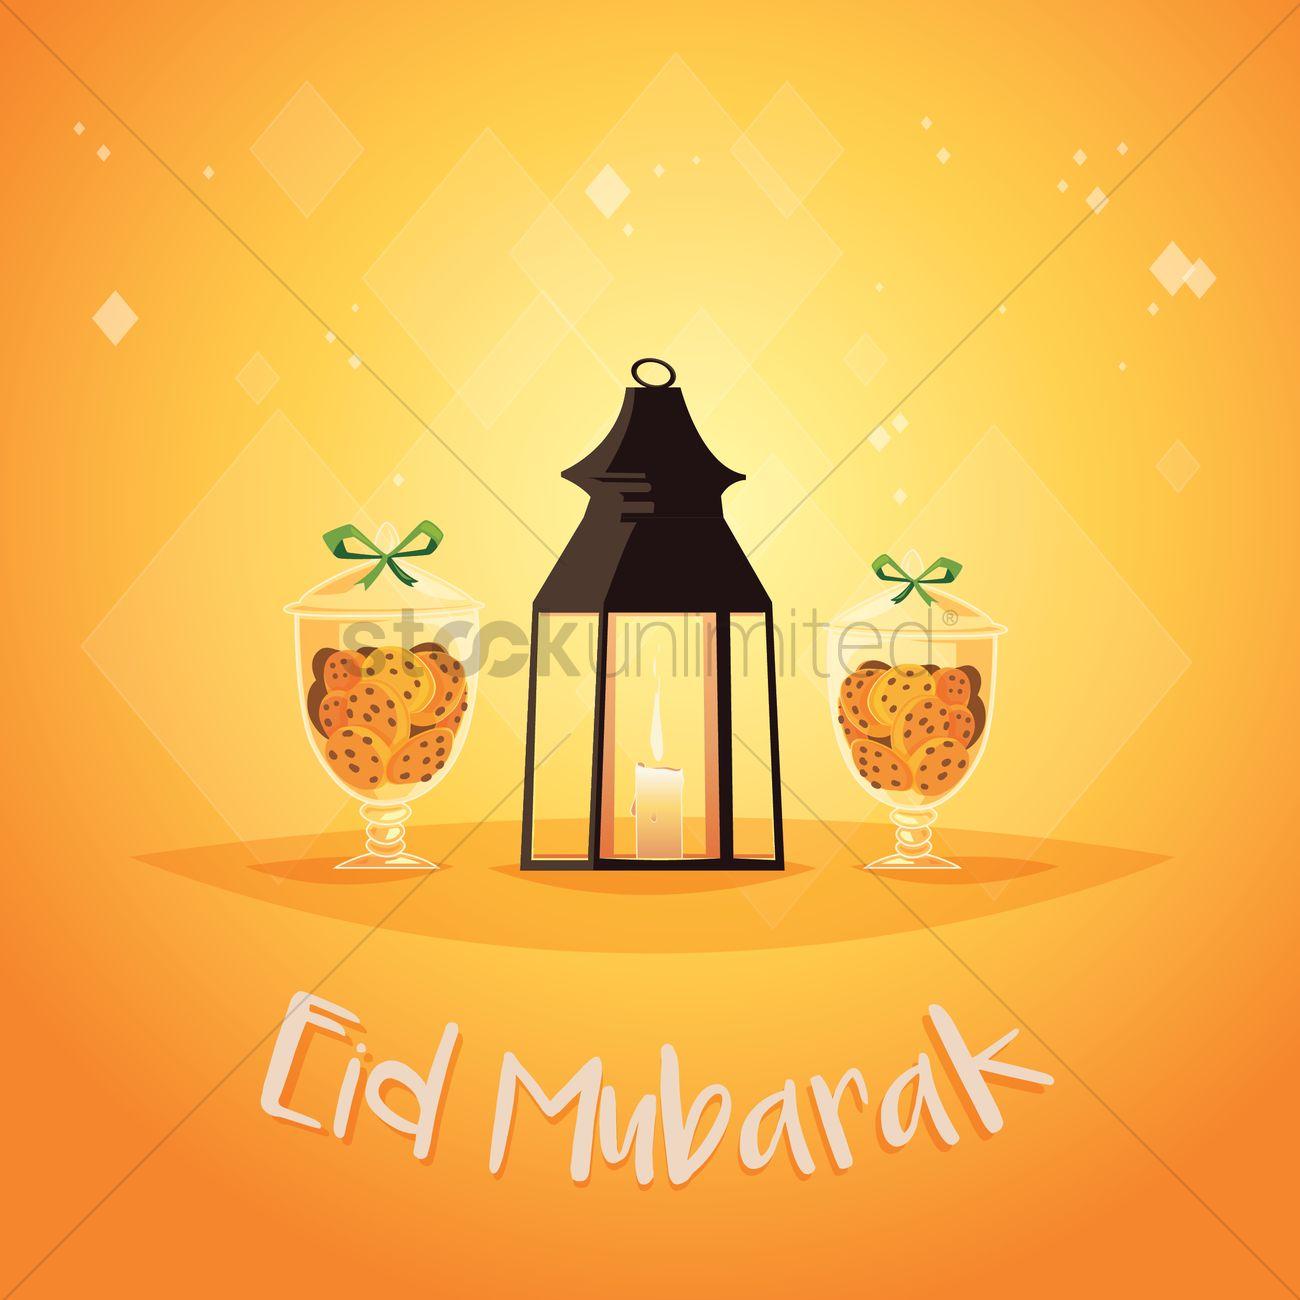 Eid Mubarak Greeting With A Ramadan Lantern Vector Image 1826803